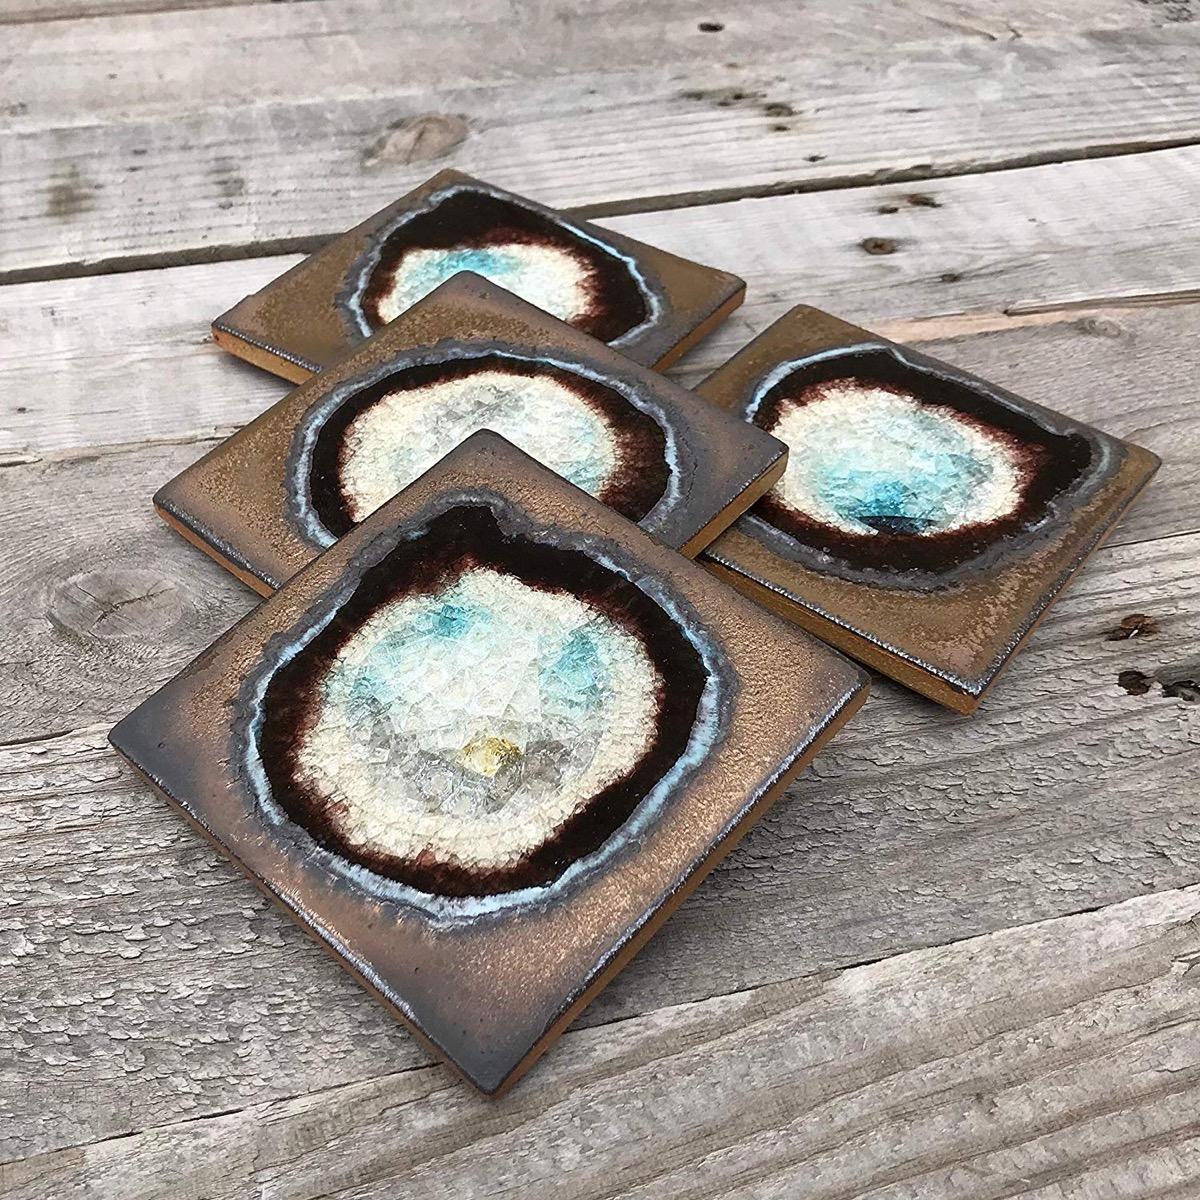 Geode Coasters {Handmade Items from Amazon}